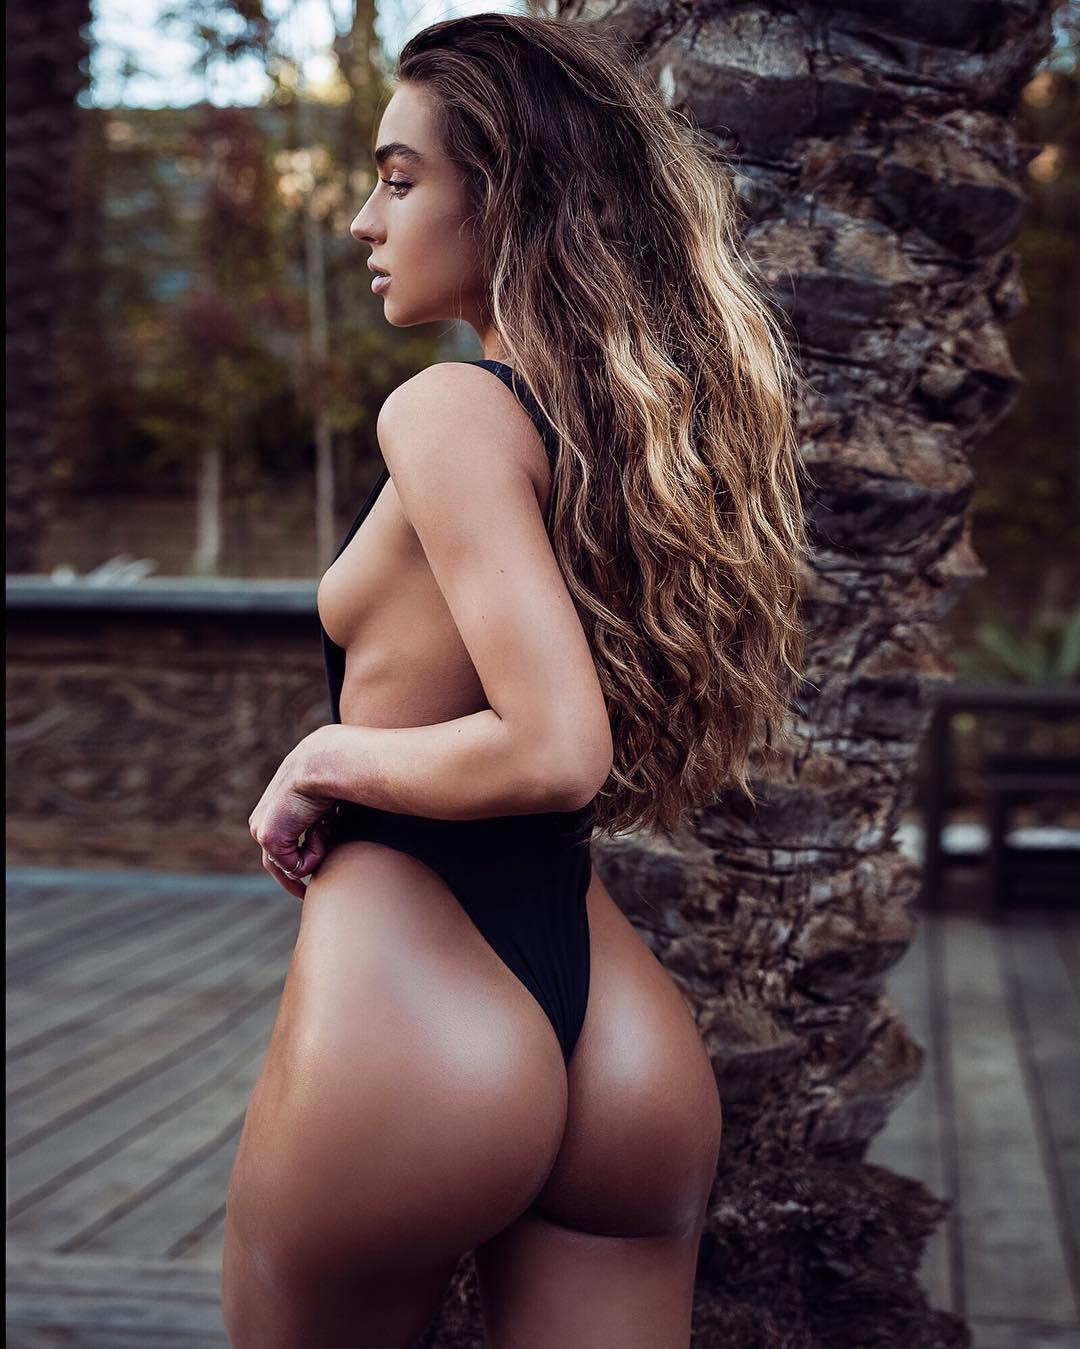 Audacia ray nude photos, femdom anal